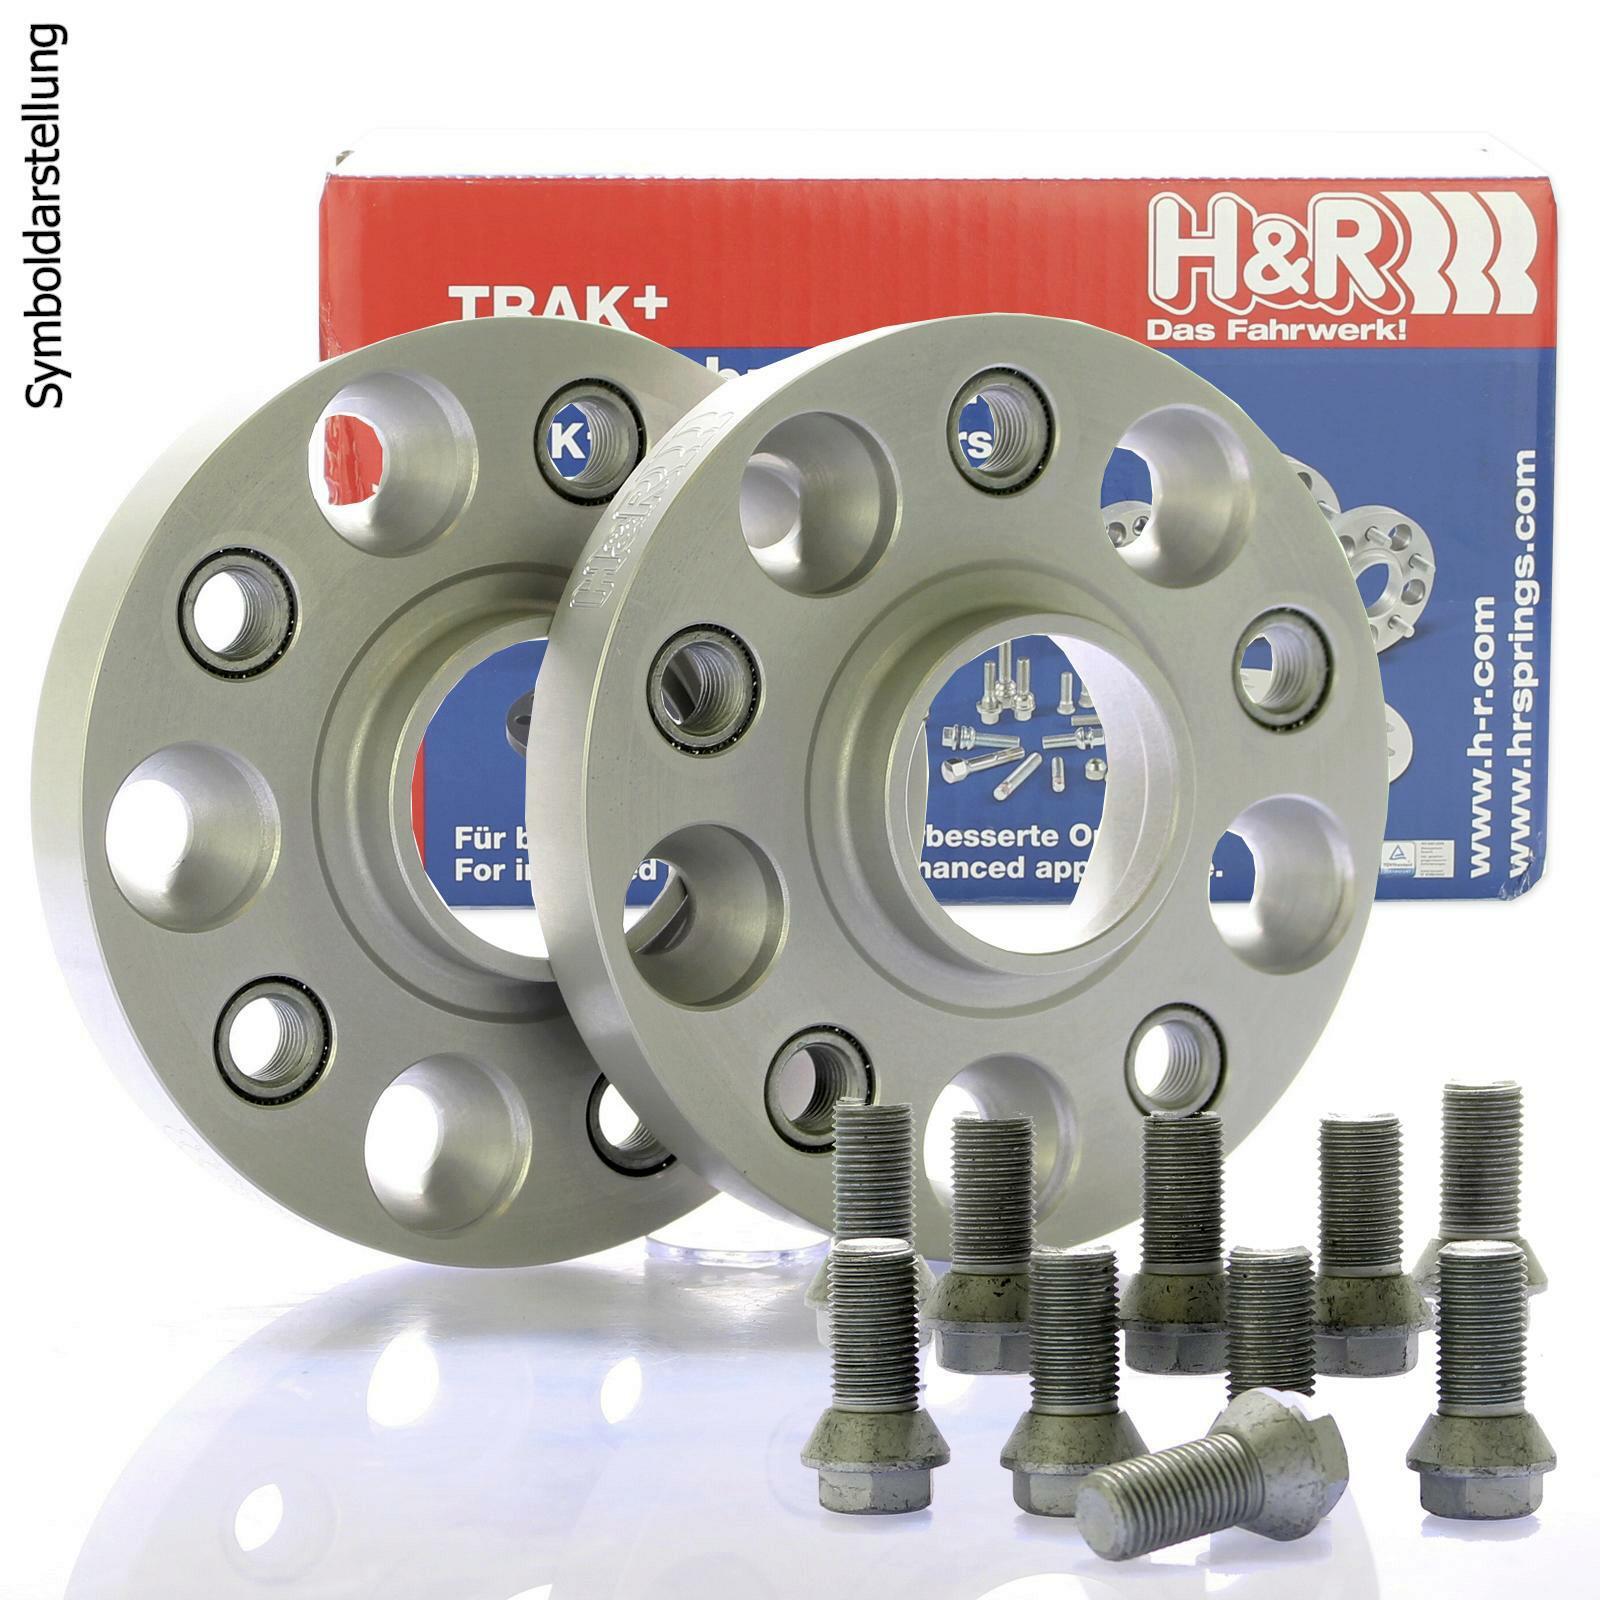 H&R DRA Spurplatten Spurverbreiterung Distanzscheibe 5x112 60mm // 2x30mm